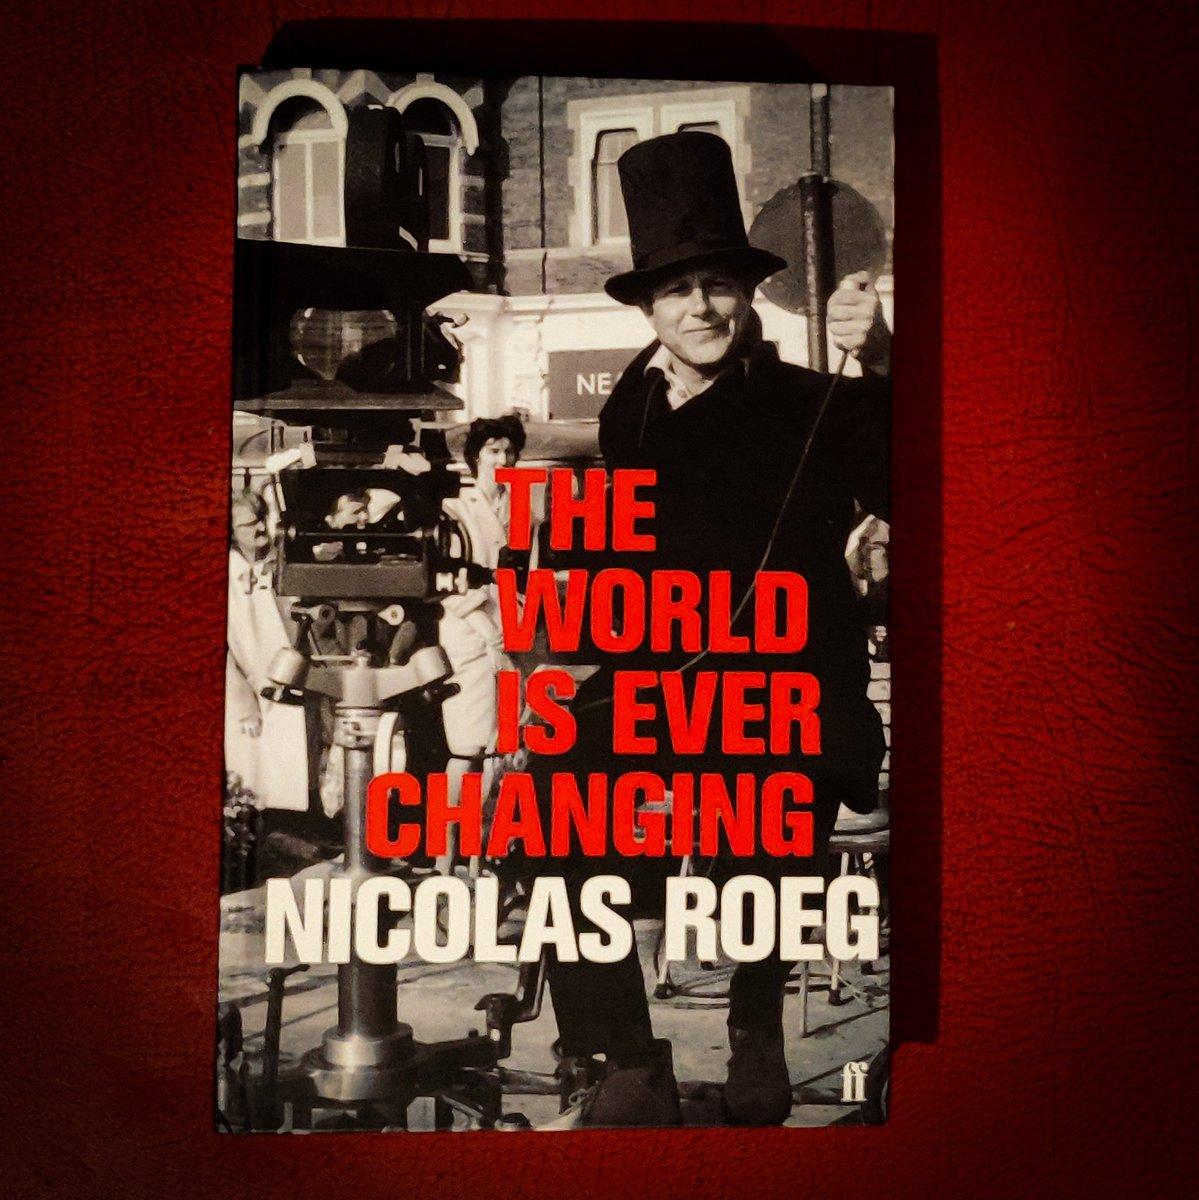 In the words of the great man himself ... #NicolasRoeg #NicRoeg #movie #movies #film #horror #sciencefiction #drama #thriller #filmdirector #book #filmbook #moviebook #cinema #cinemabooks #cinamatography #cinematographer #directorofphotography #directorpic.twitter.com/BGJY3jNvQA